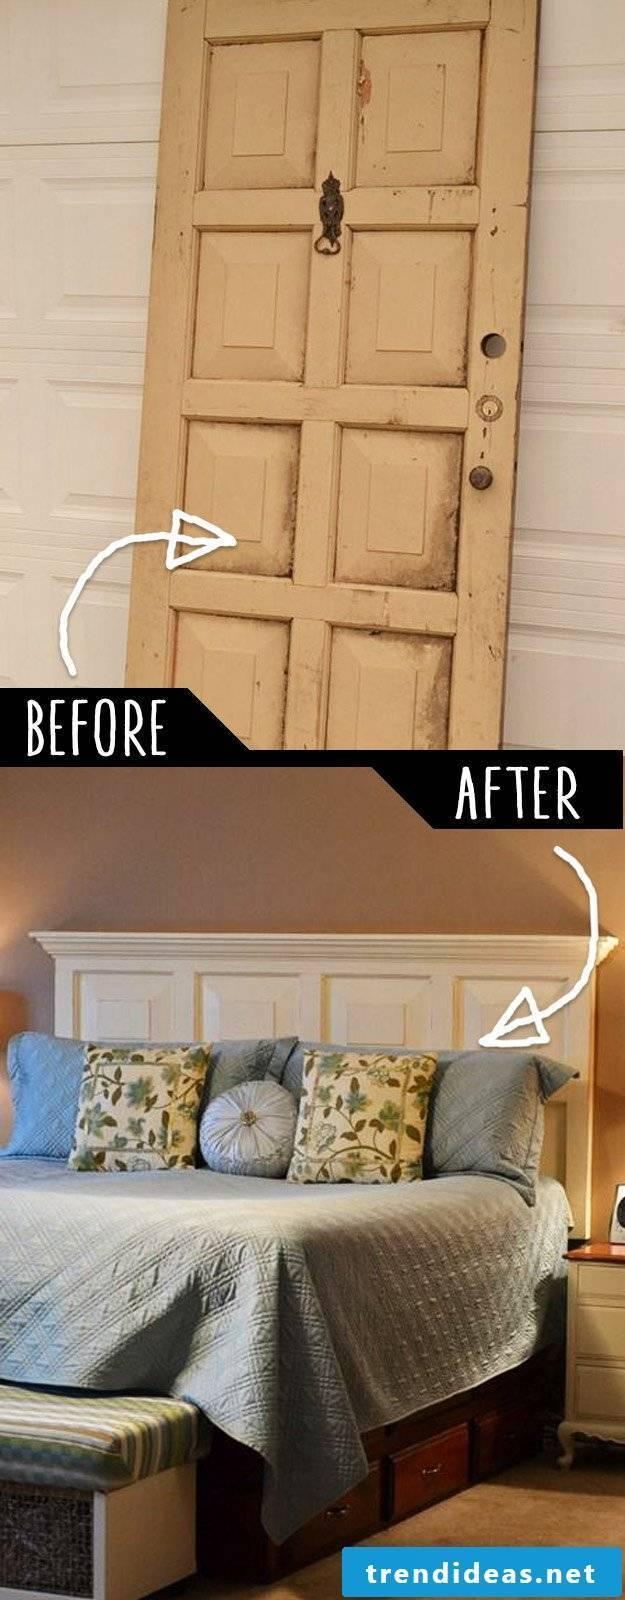 Do it yourself hacks with an old door